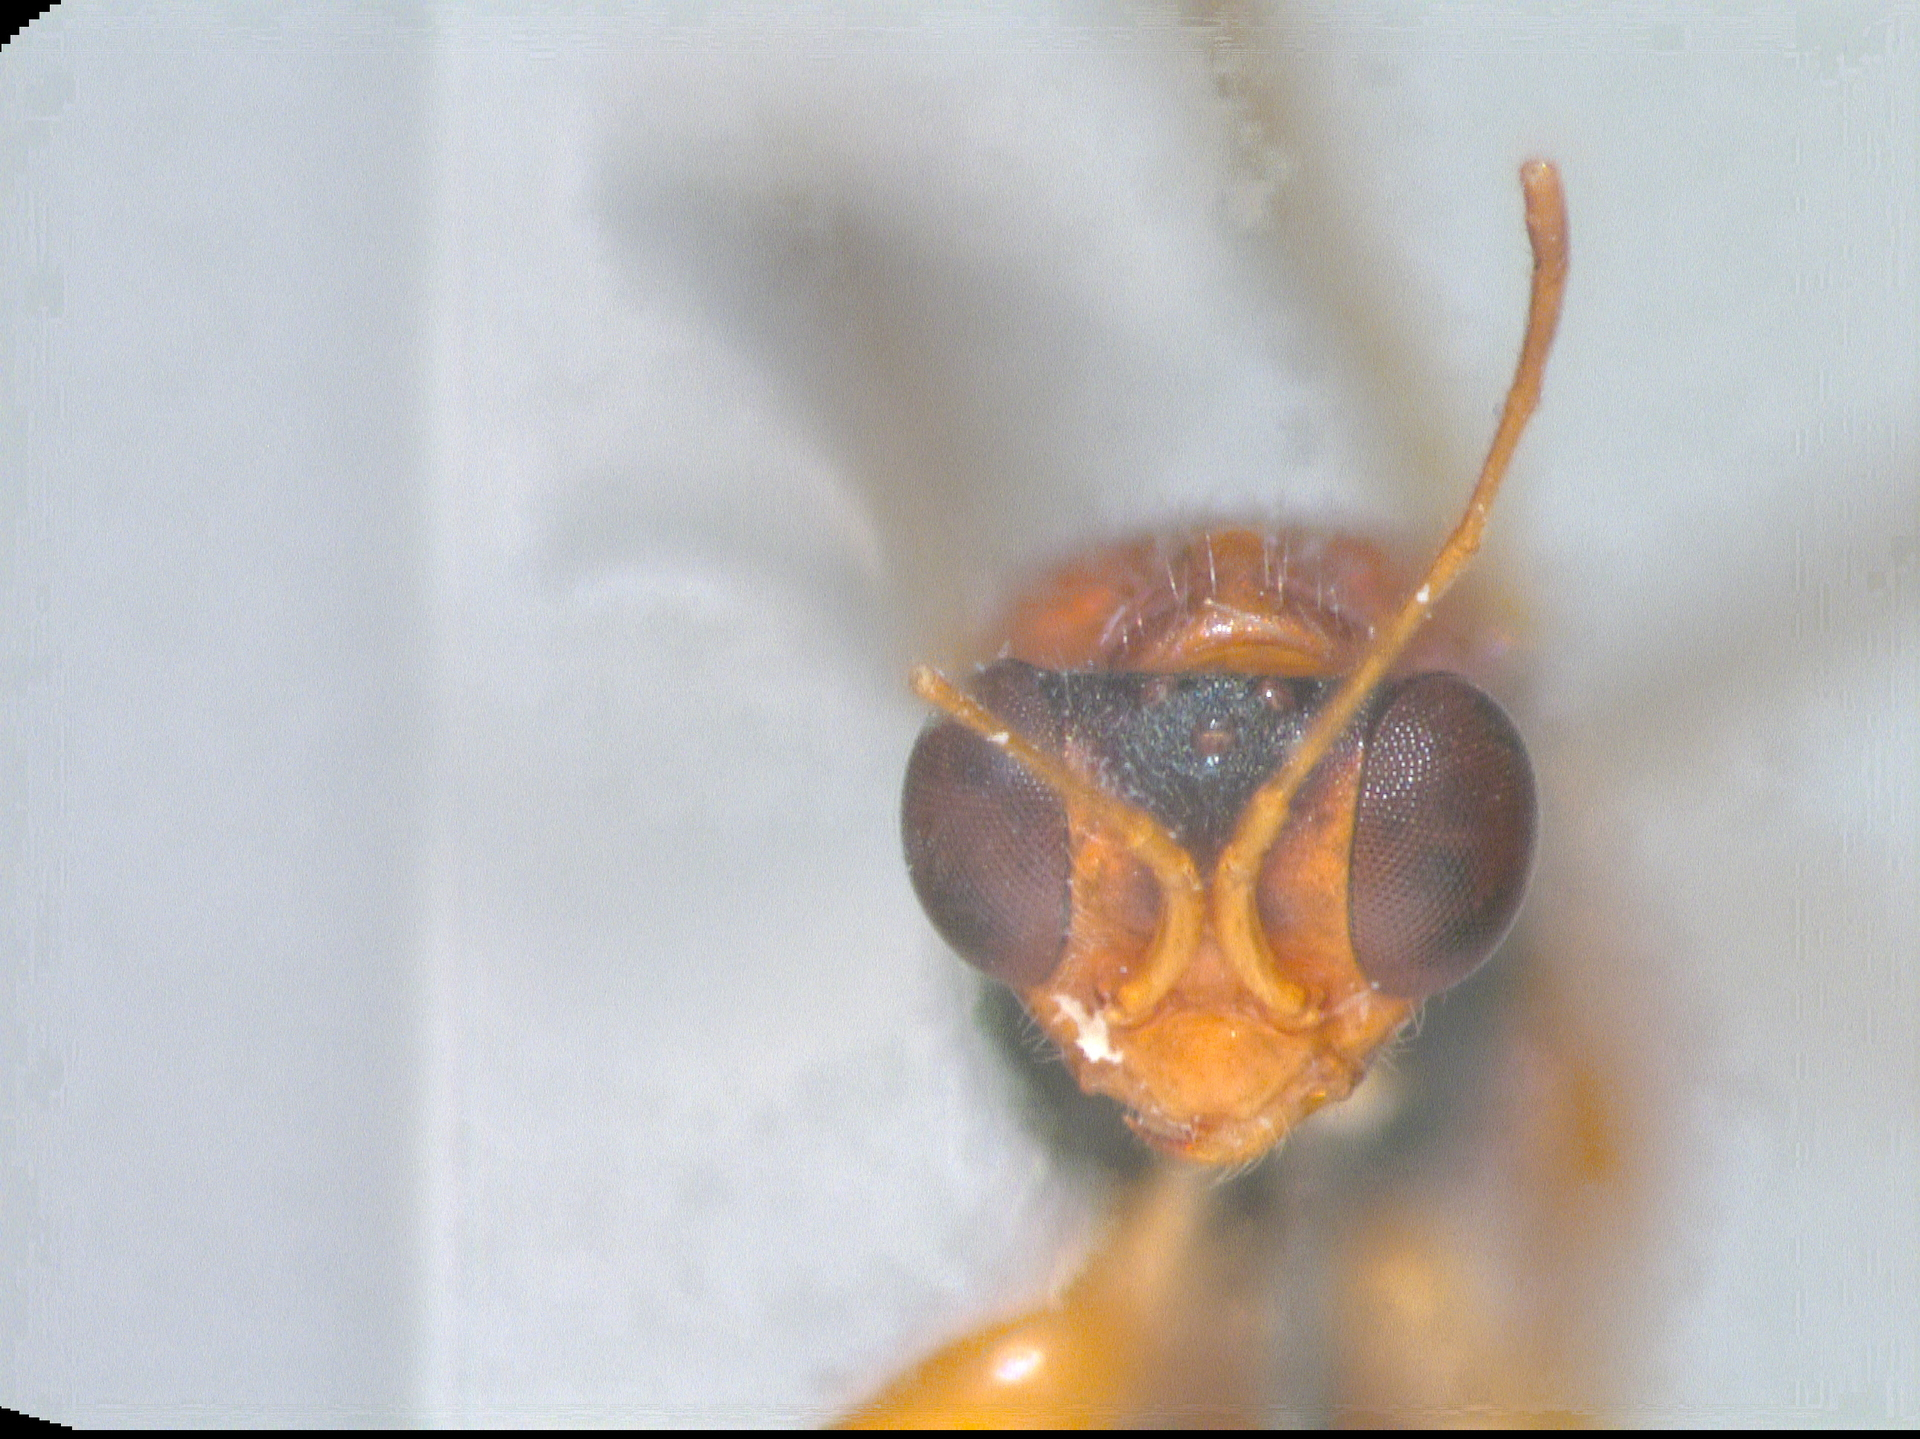 RMNH.INS.959869 | Alphadryinus rufus Olmi, 1984